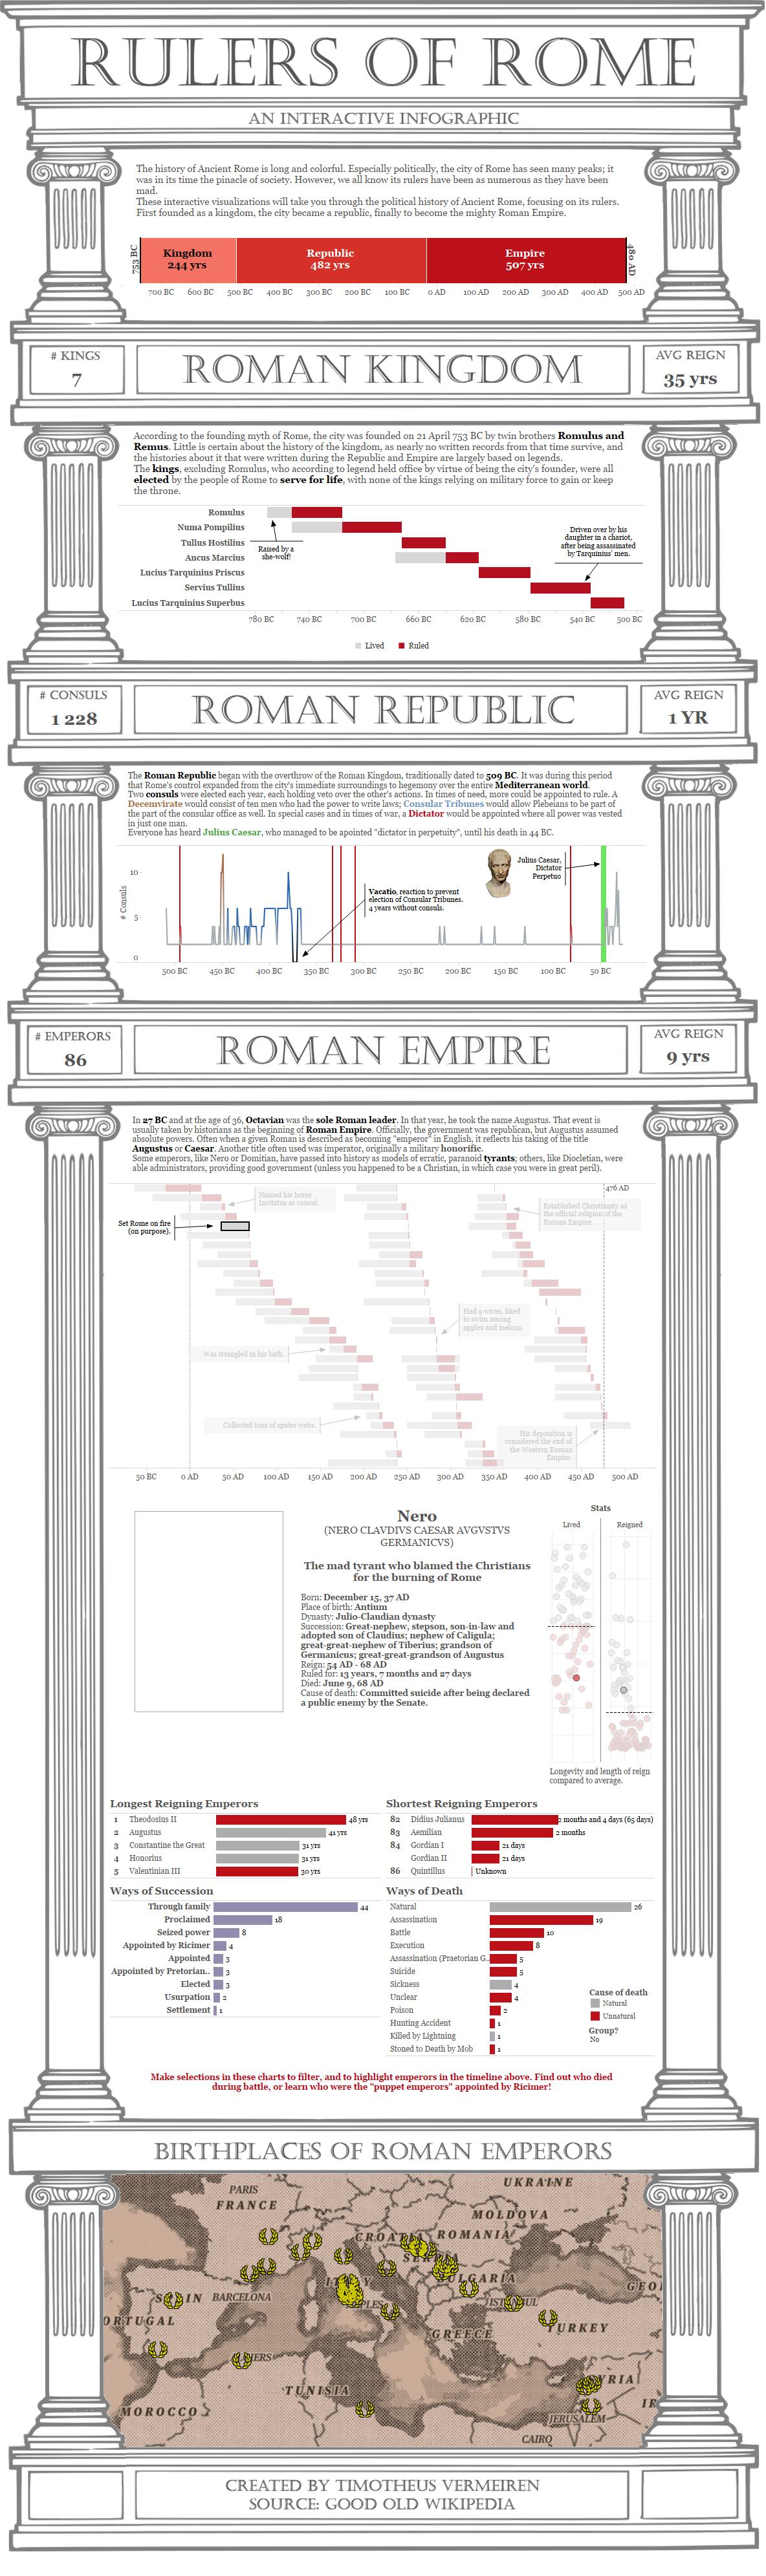 Rulers of Rome 2